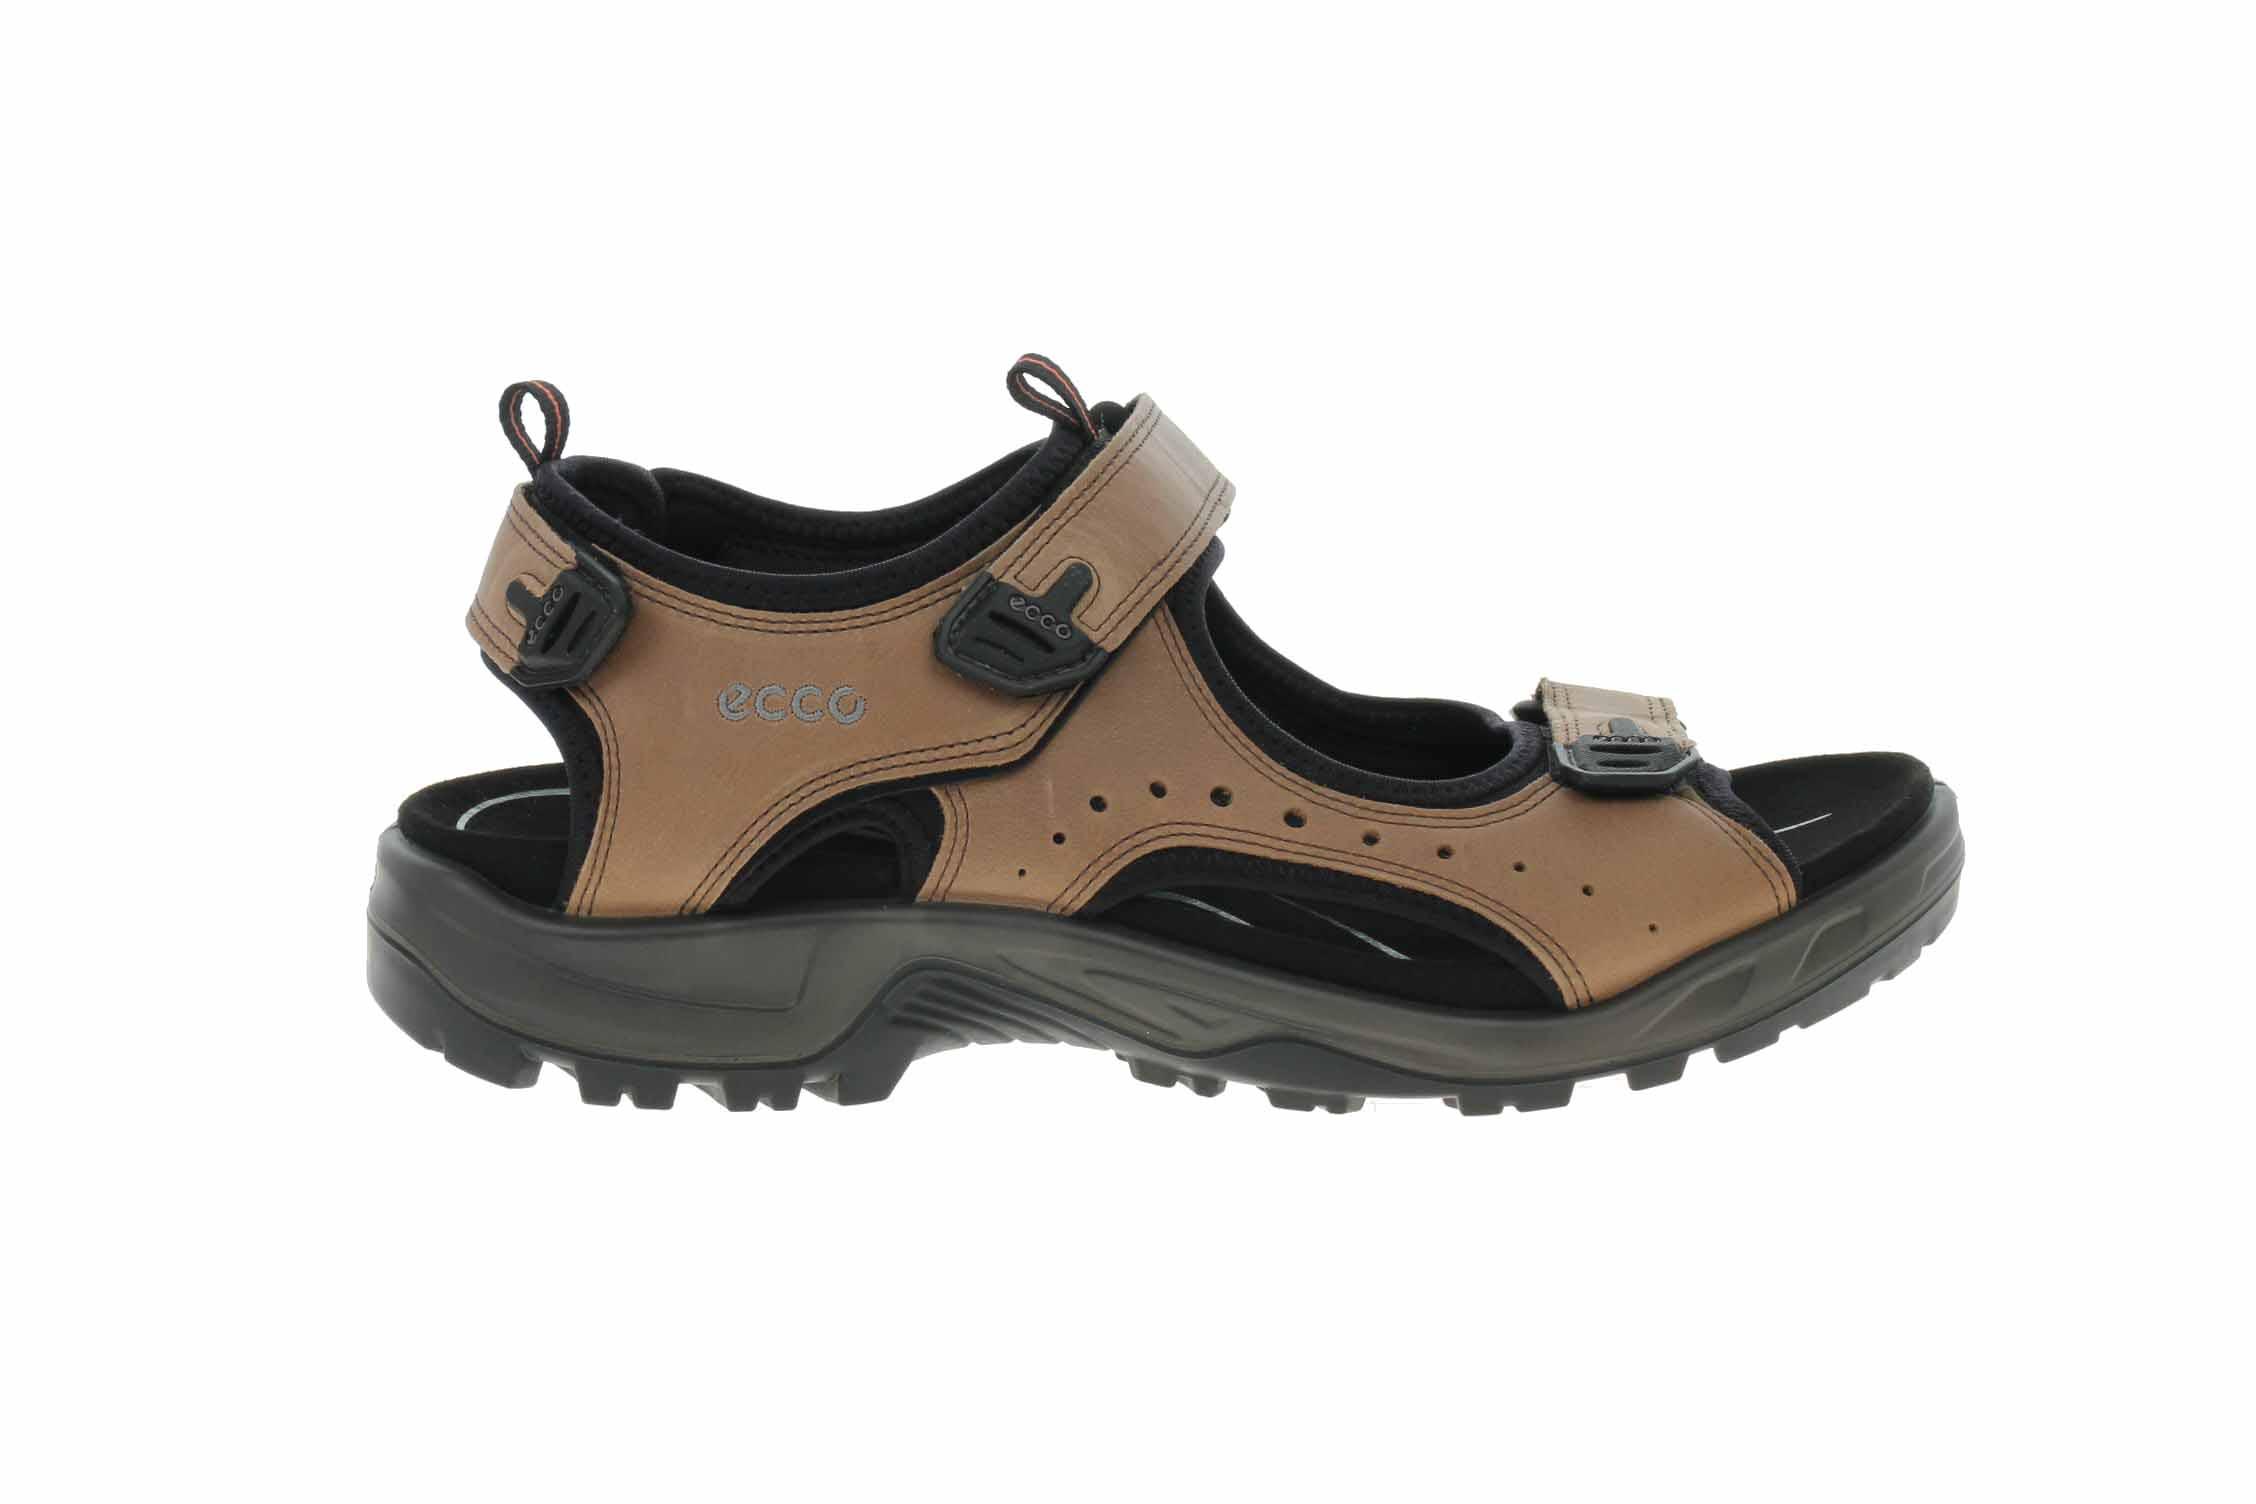 d8453aa6a872 Ecco Offroad pánské sandály 82204402114 navajo brown